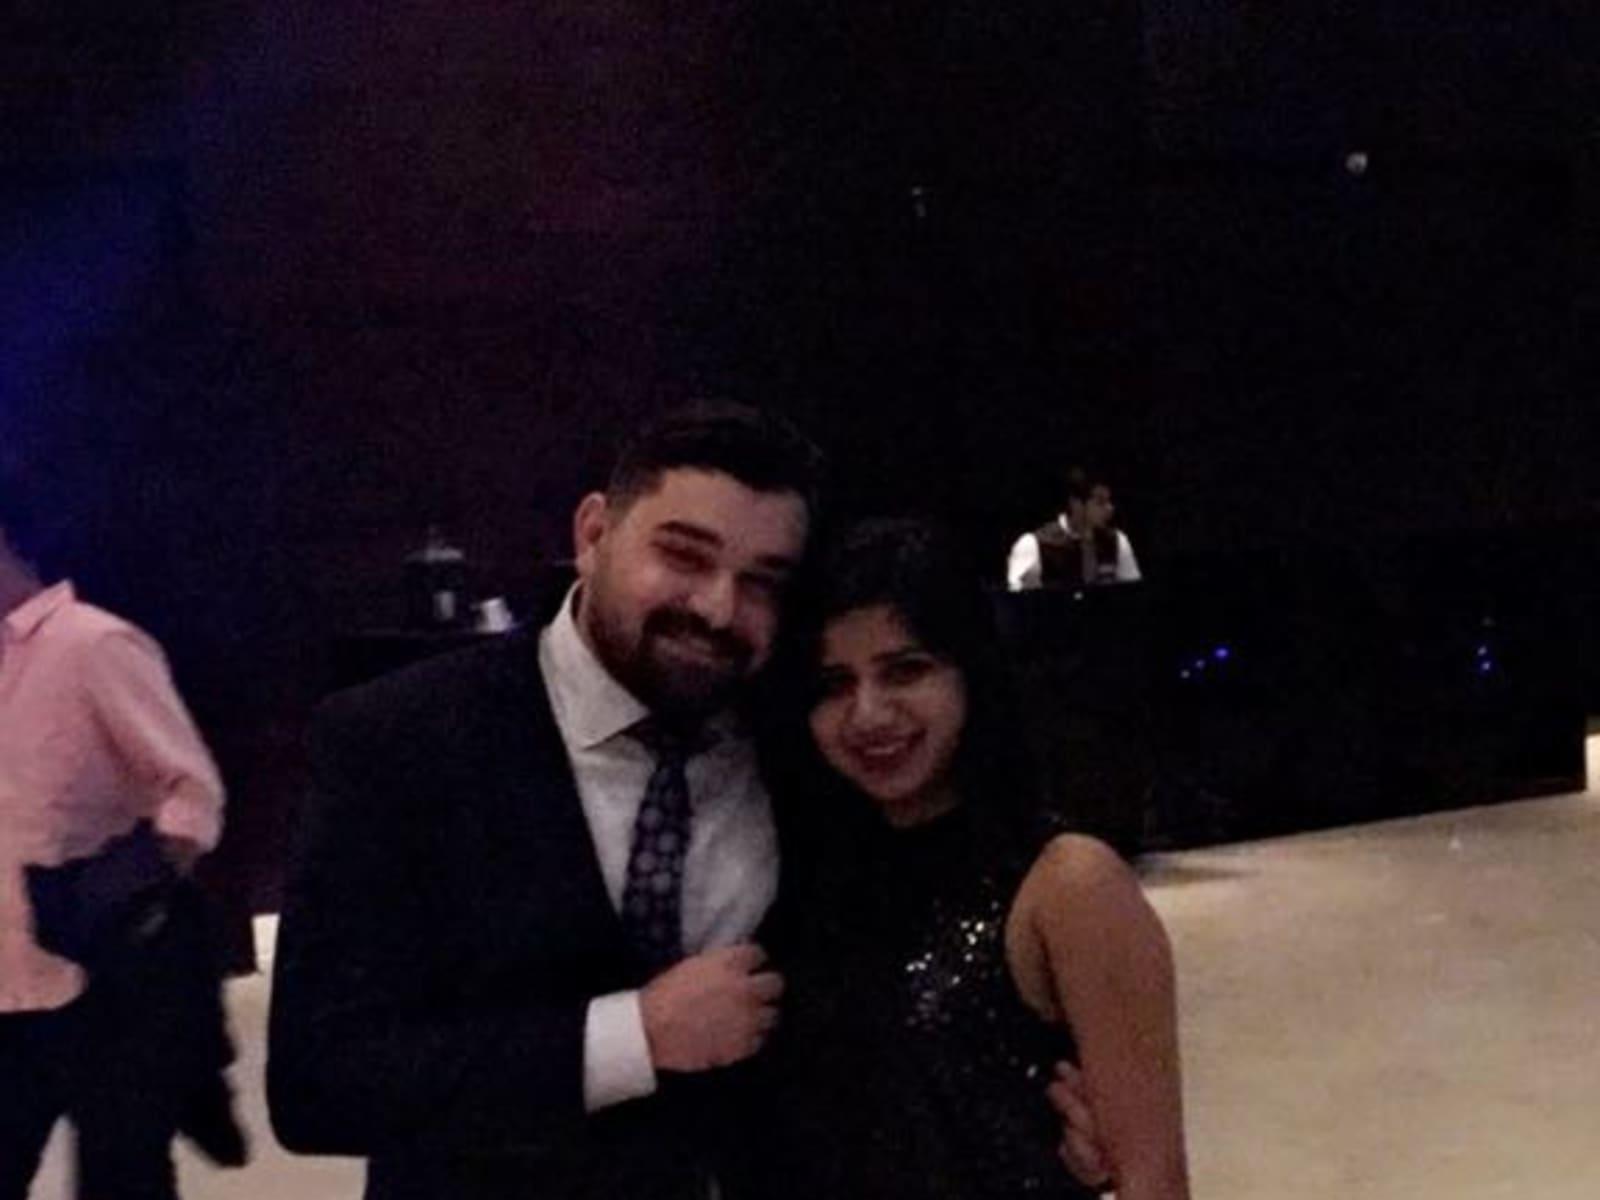 Nayab & Basem from Toronto, Ontario, Canada